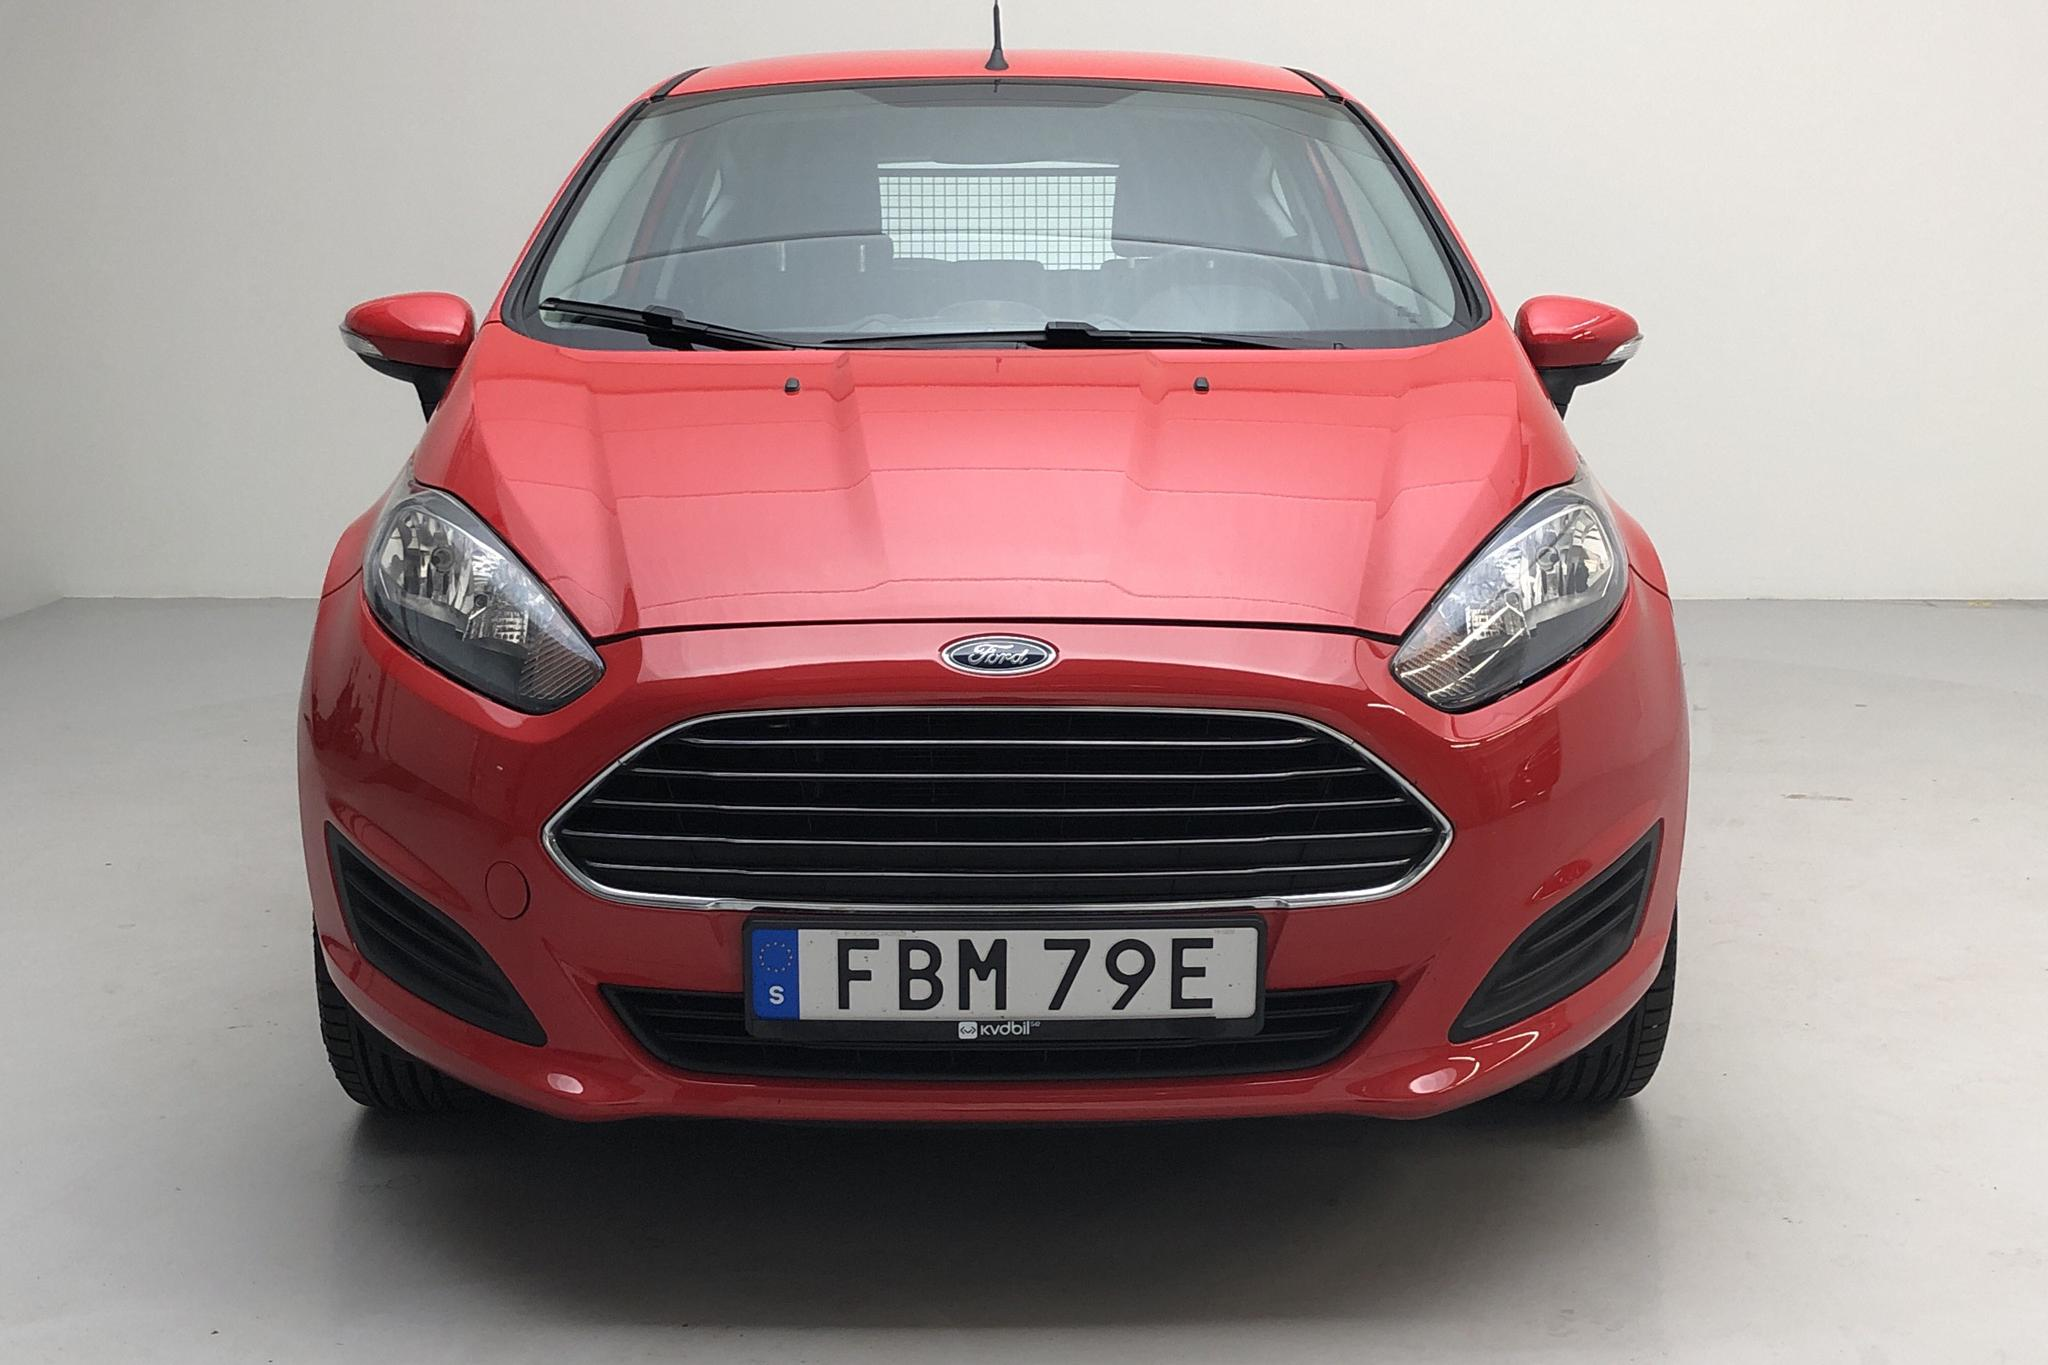 Ford Fiesta 1.25 3dr (60hk) - 47 720 km - Manual - red - 2013